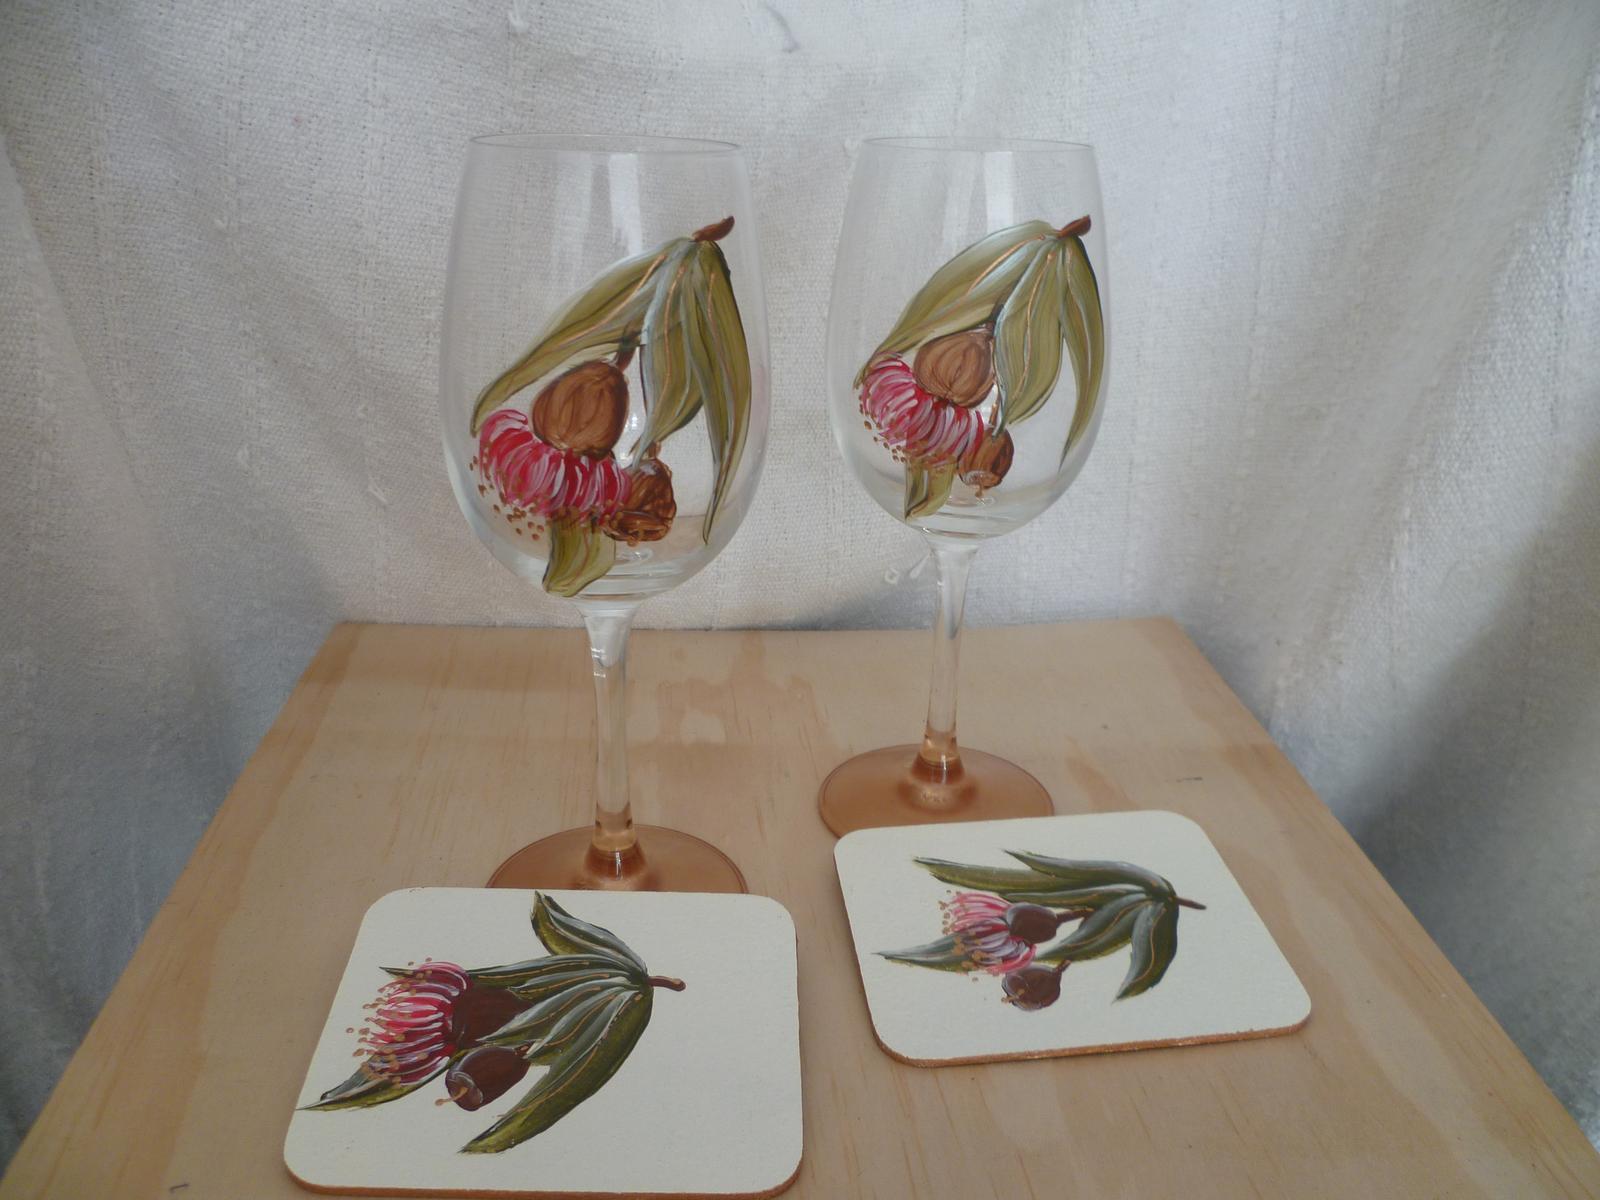 Gumnut Glasses and coasters